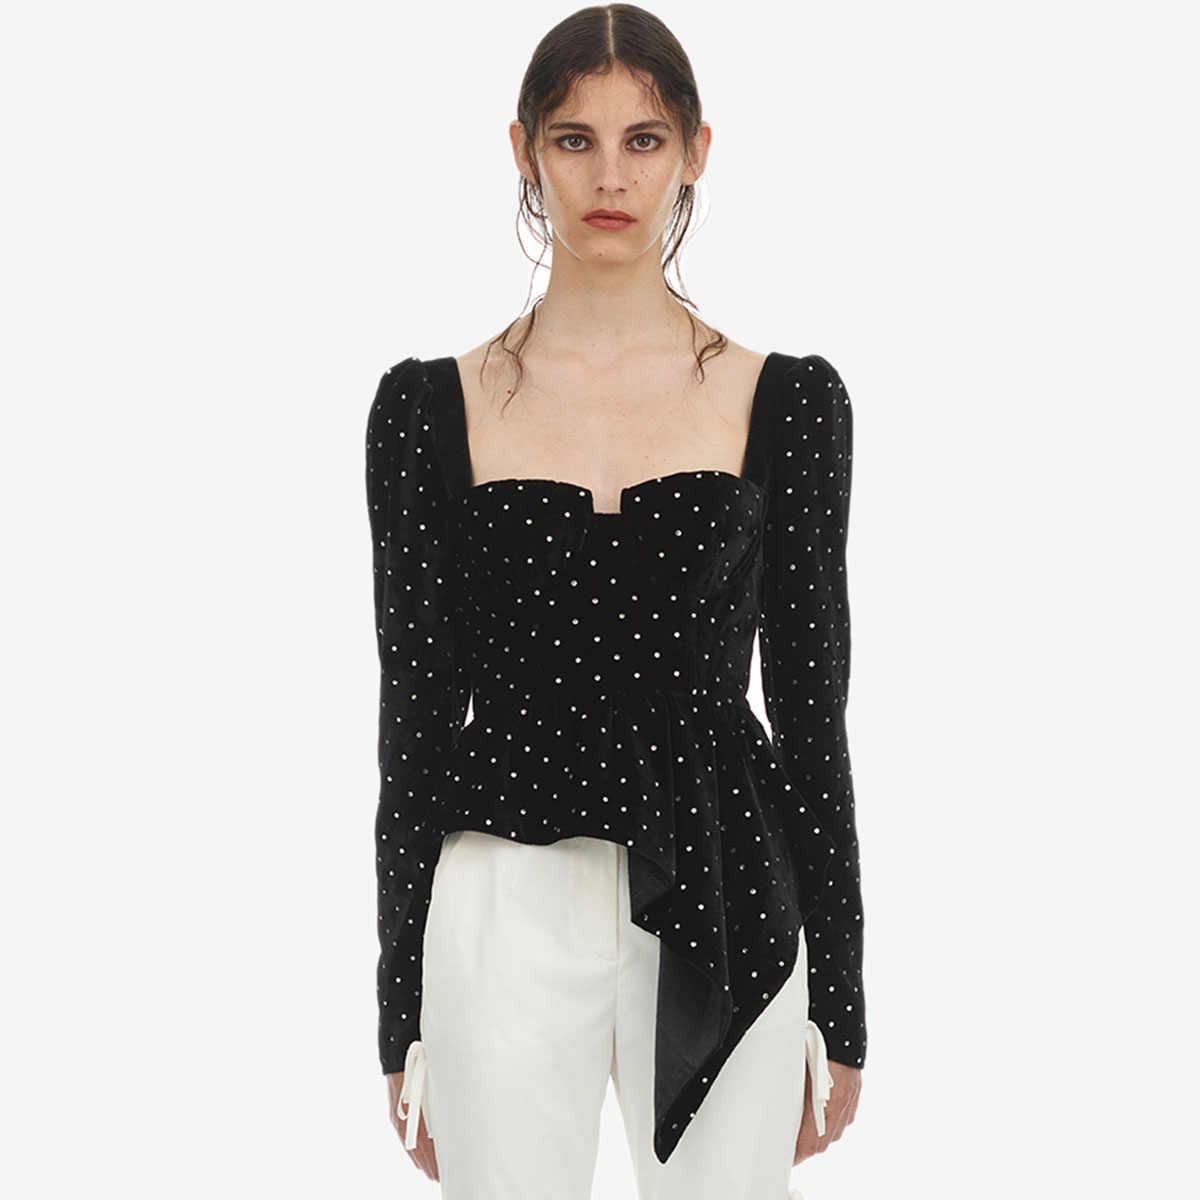 eb238acee246 Jastie Asymmetric Velvet Diamante Top Square Collar Bodice Tops Open Back  with Tie Sexy Women Shirts